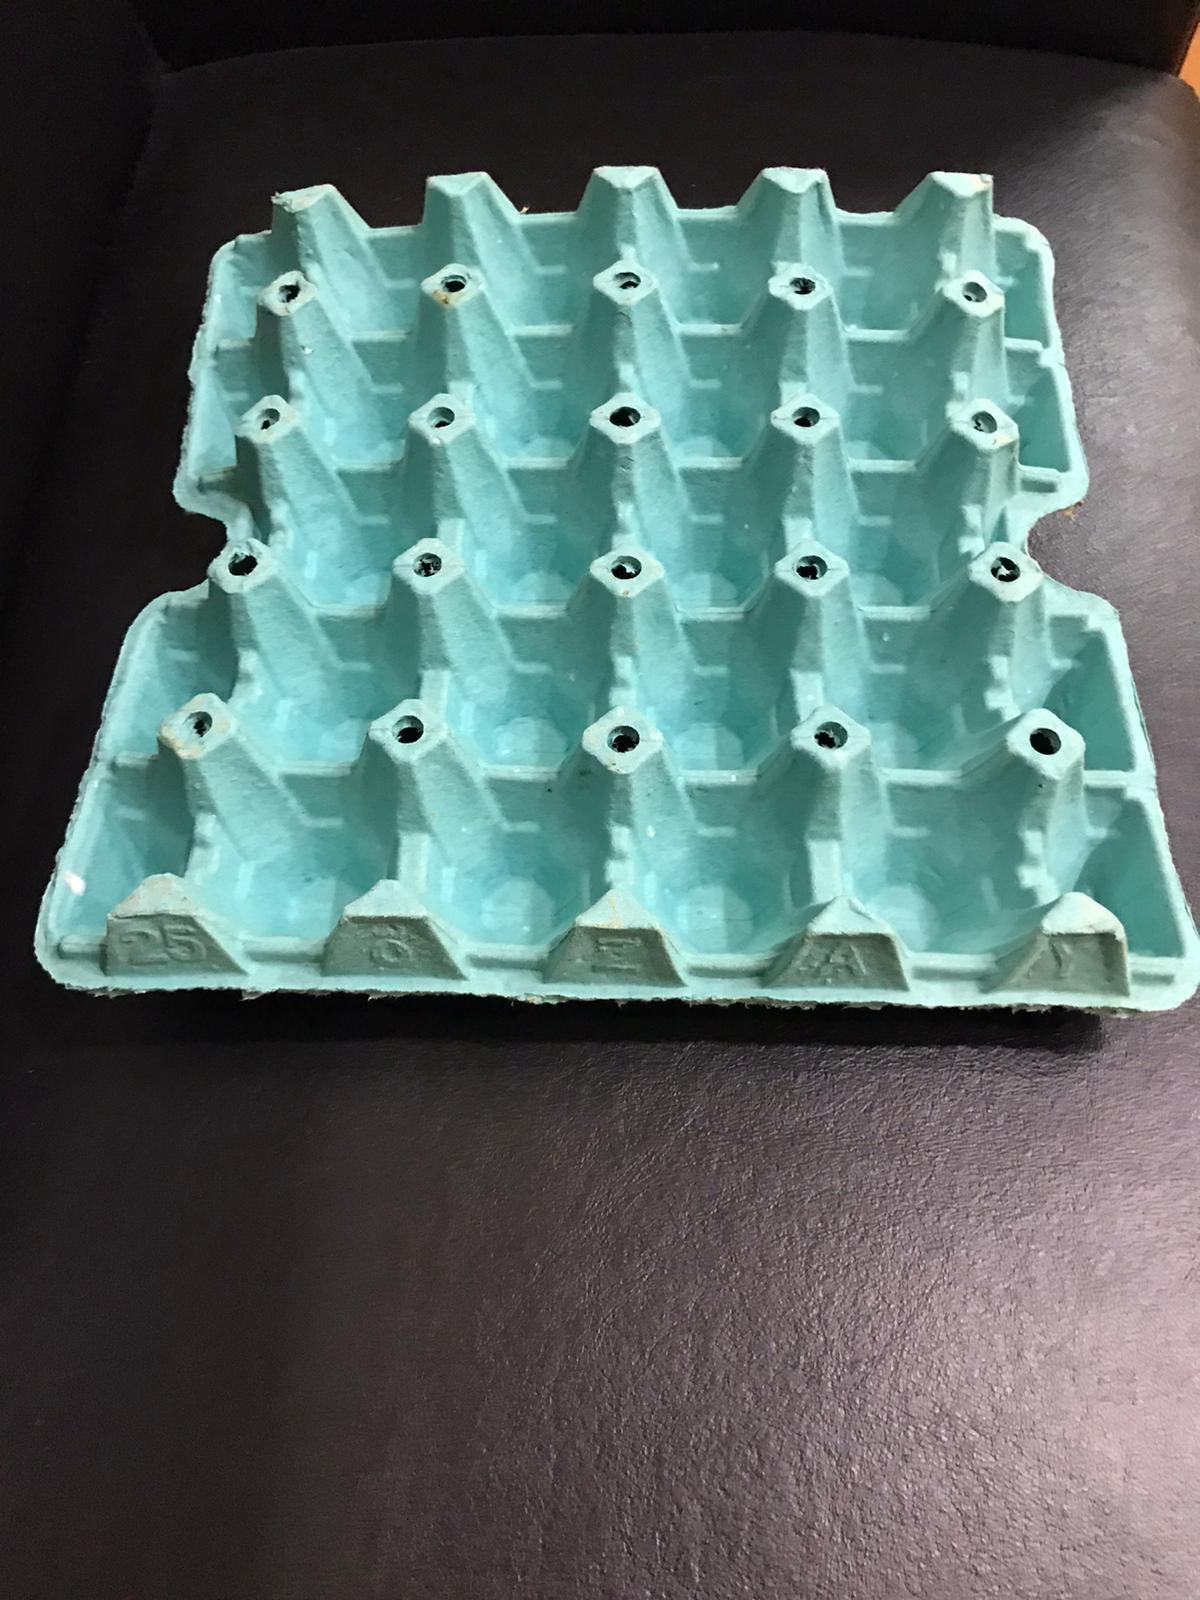 20lbs Green 20-Egg Tray